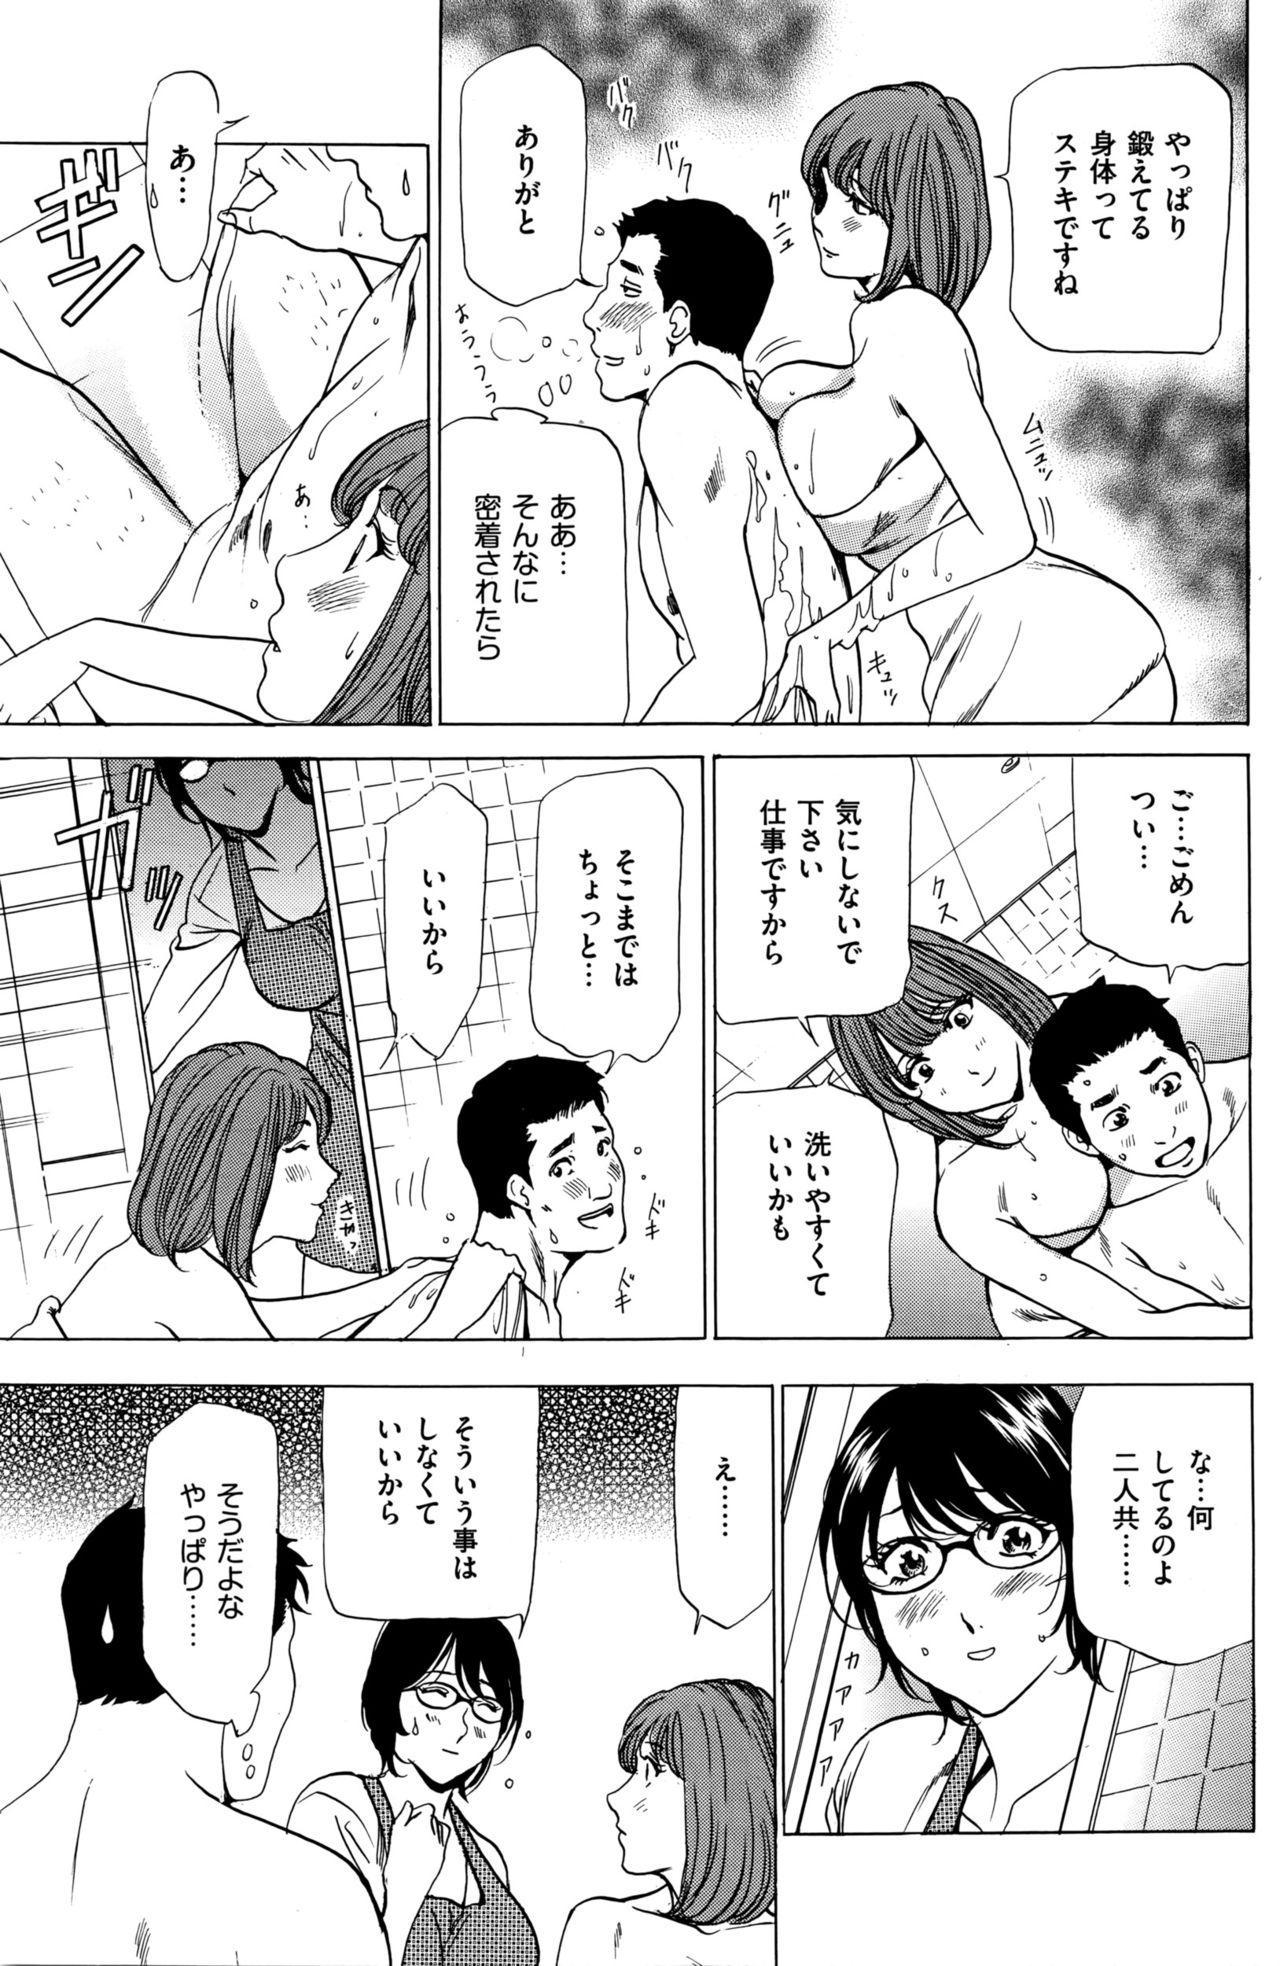 Wa Usuki Ipa a 1-10 43